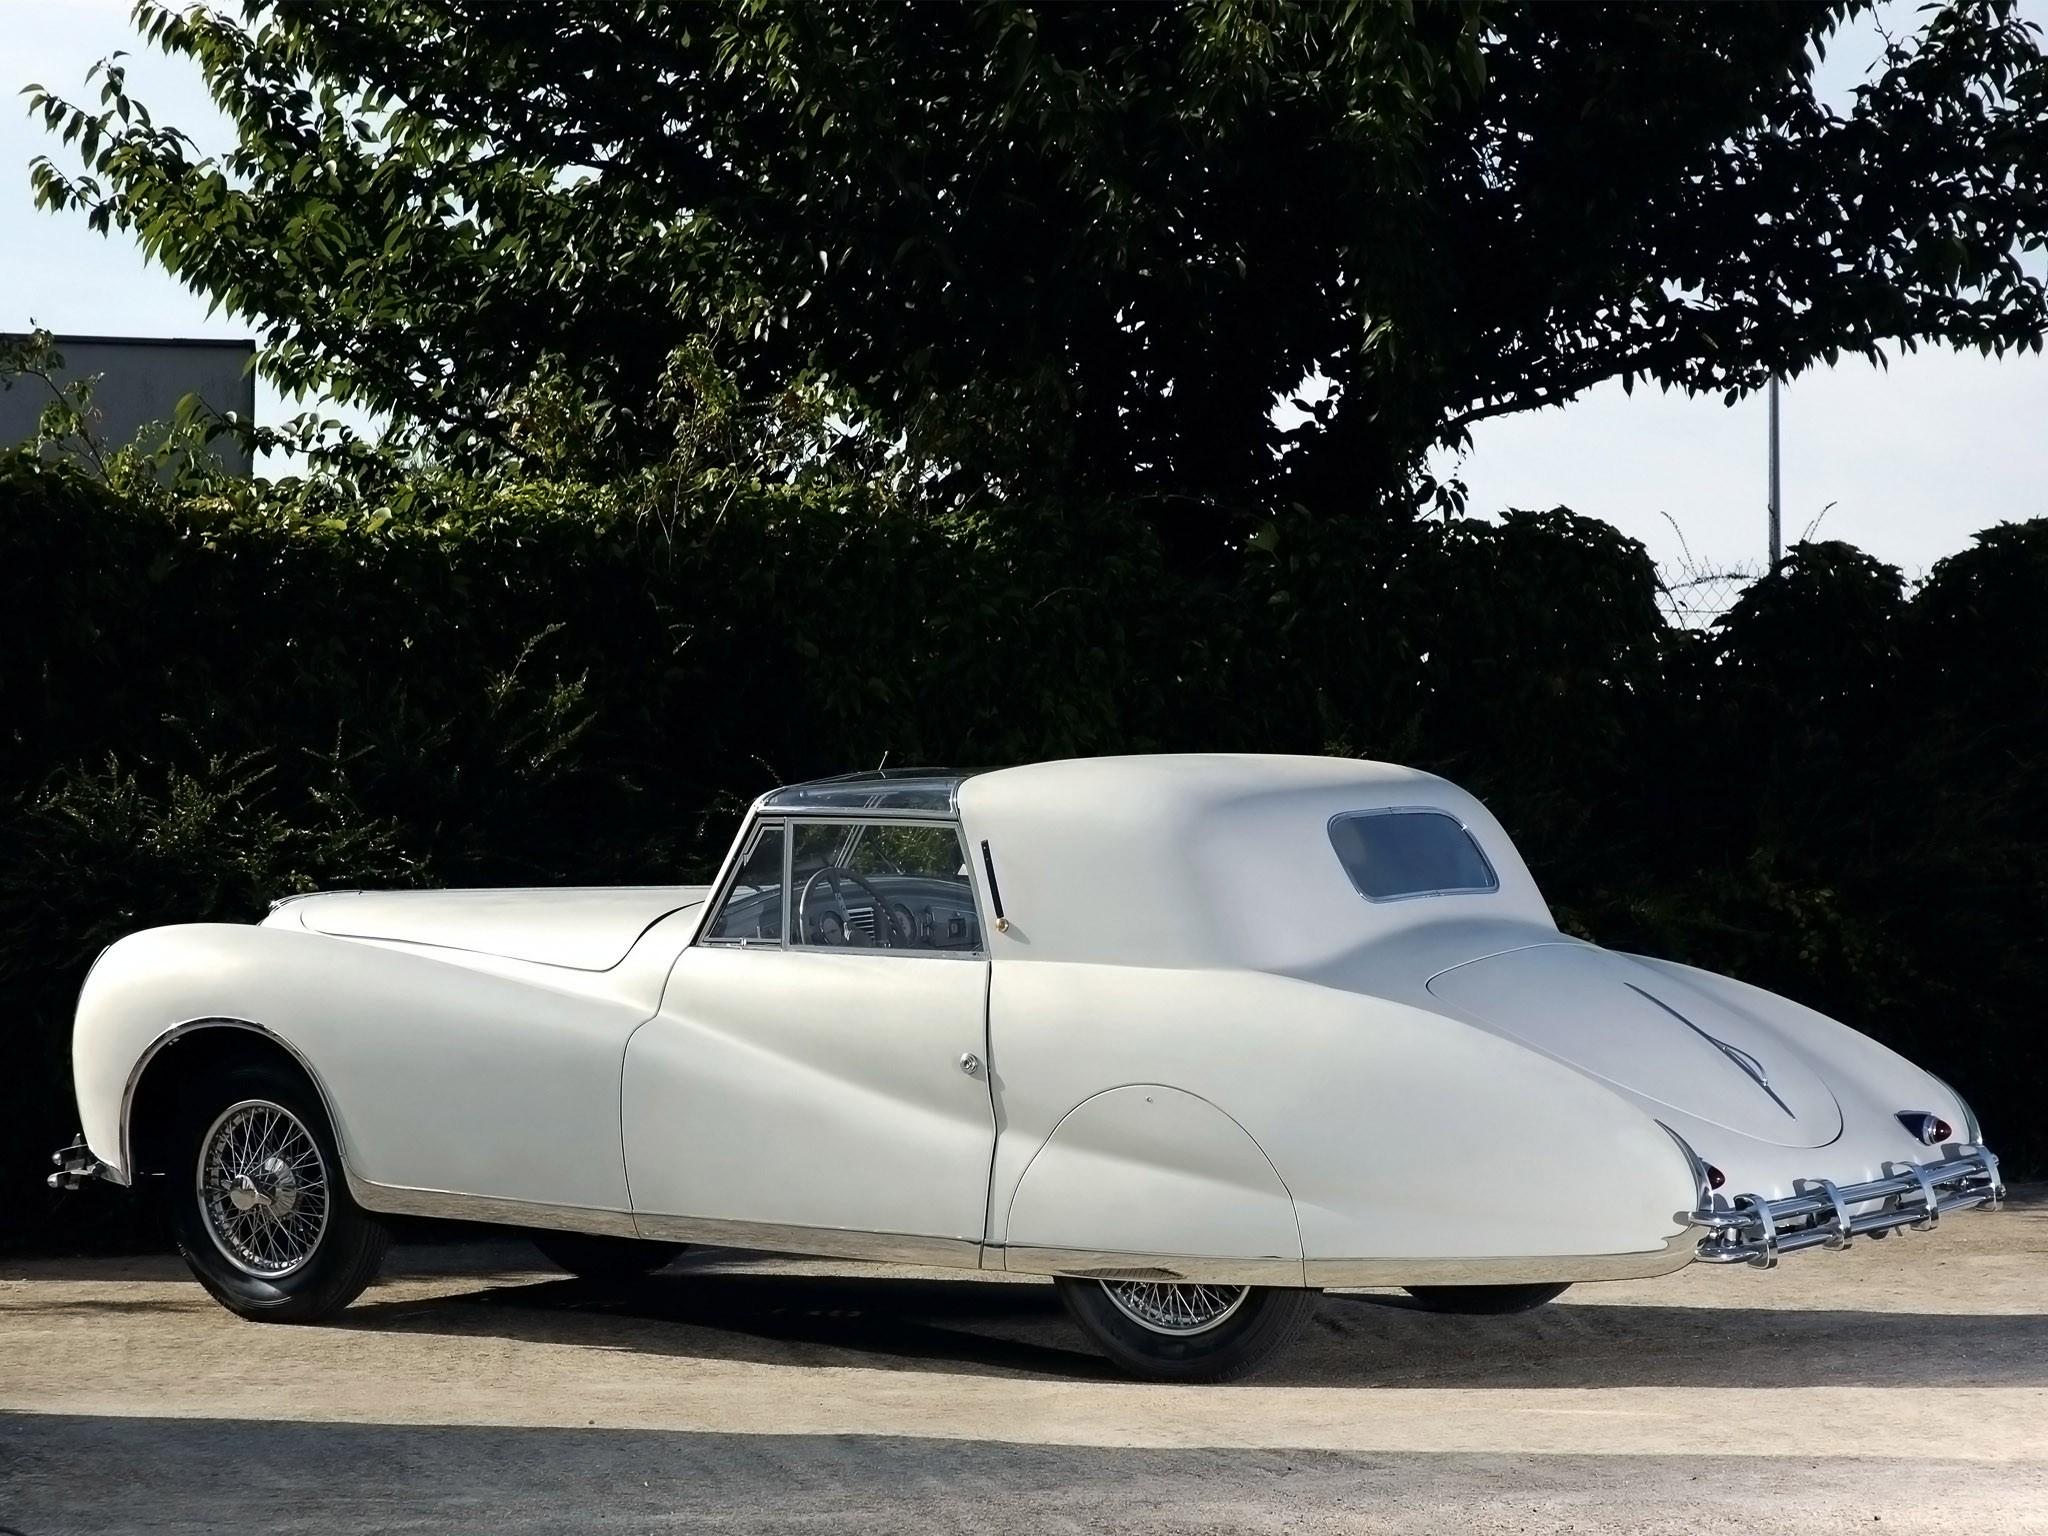 1948 Delahaye 175 S Coupe Deville Aerodynamic by Figoni et Falaschi